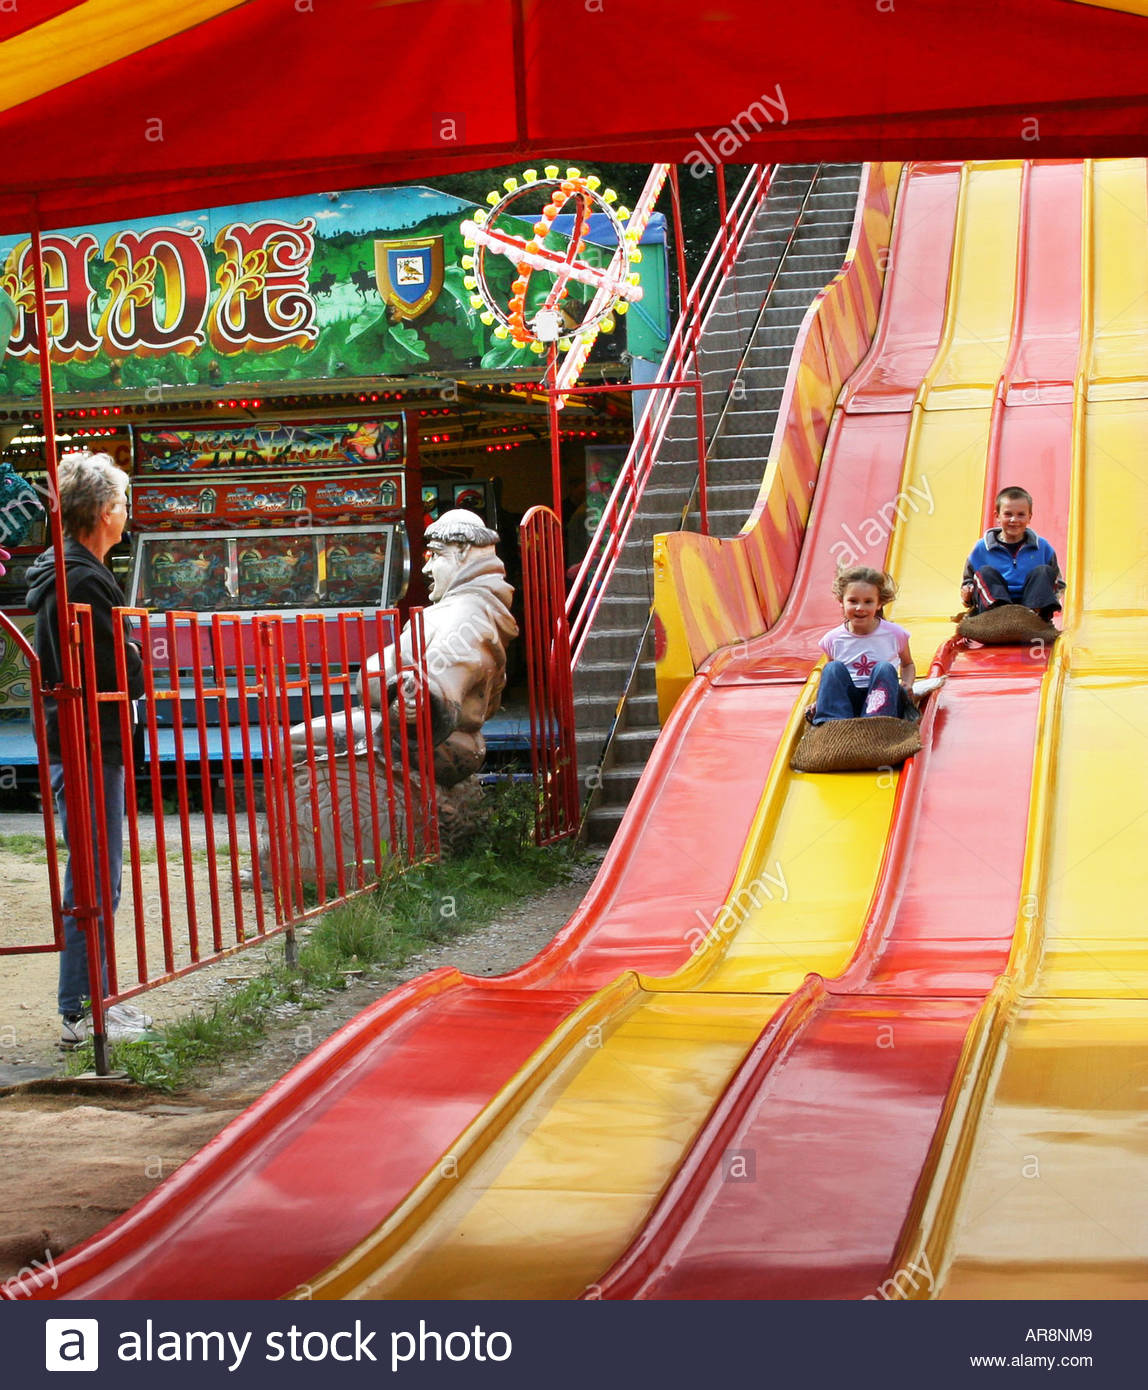 children enjoying the slide at Sherwood Forest Fun Park - Stock Image